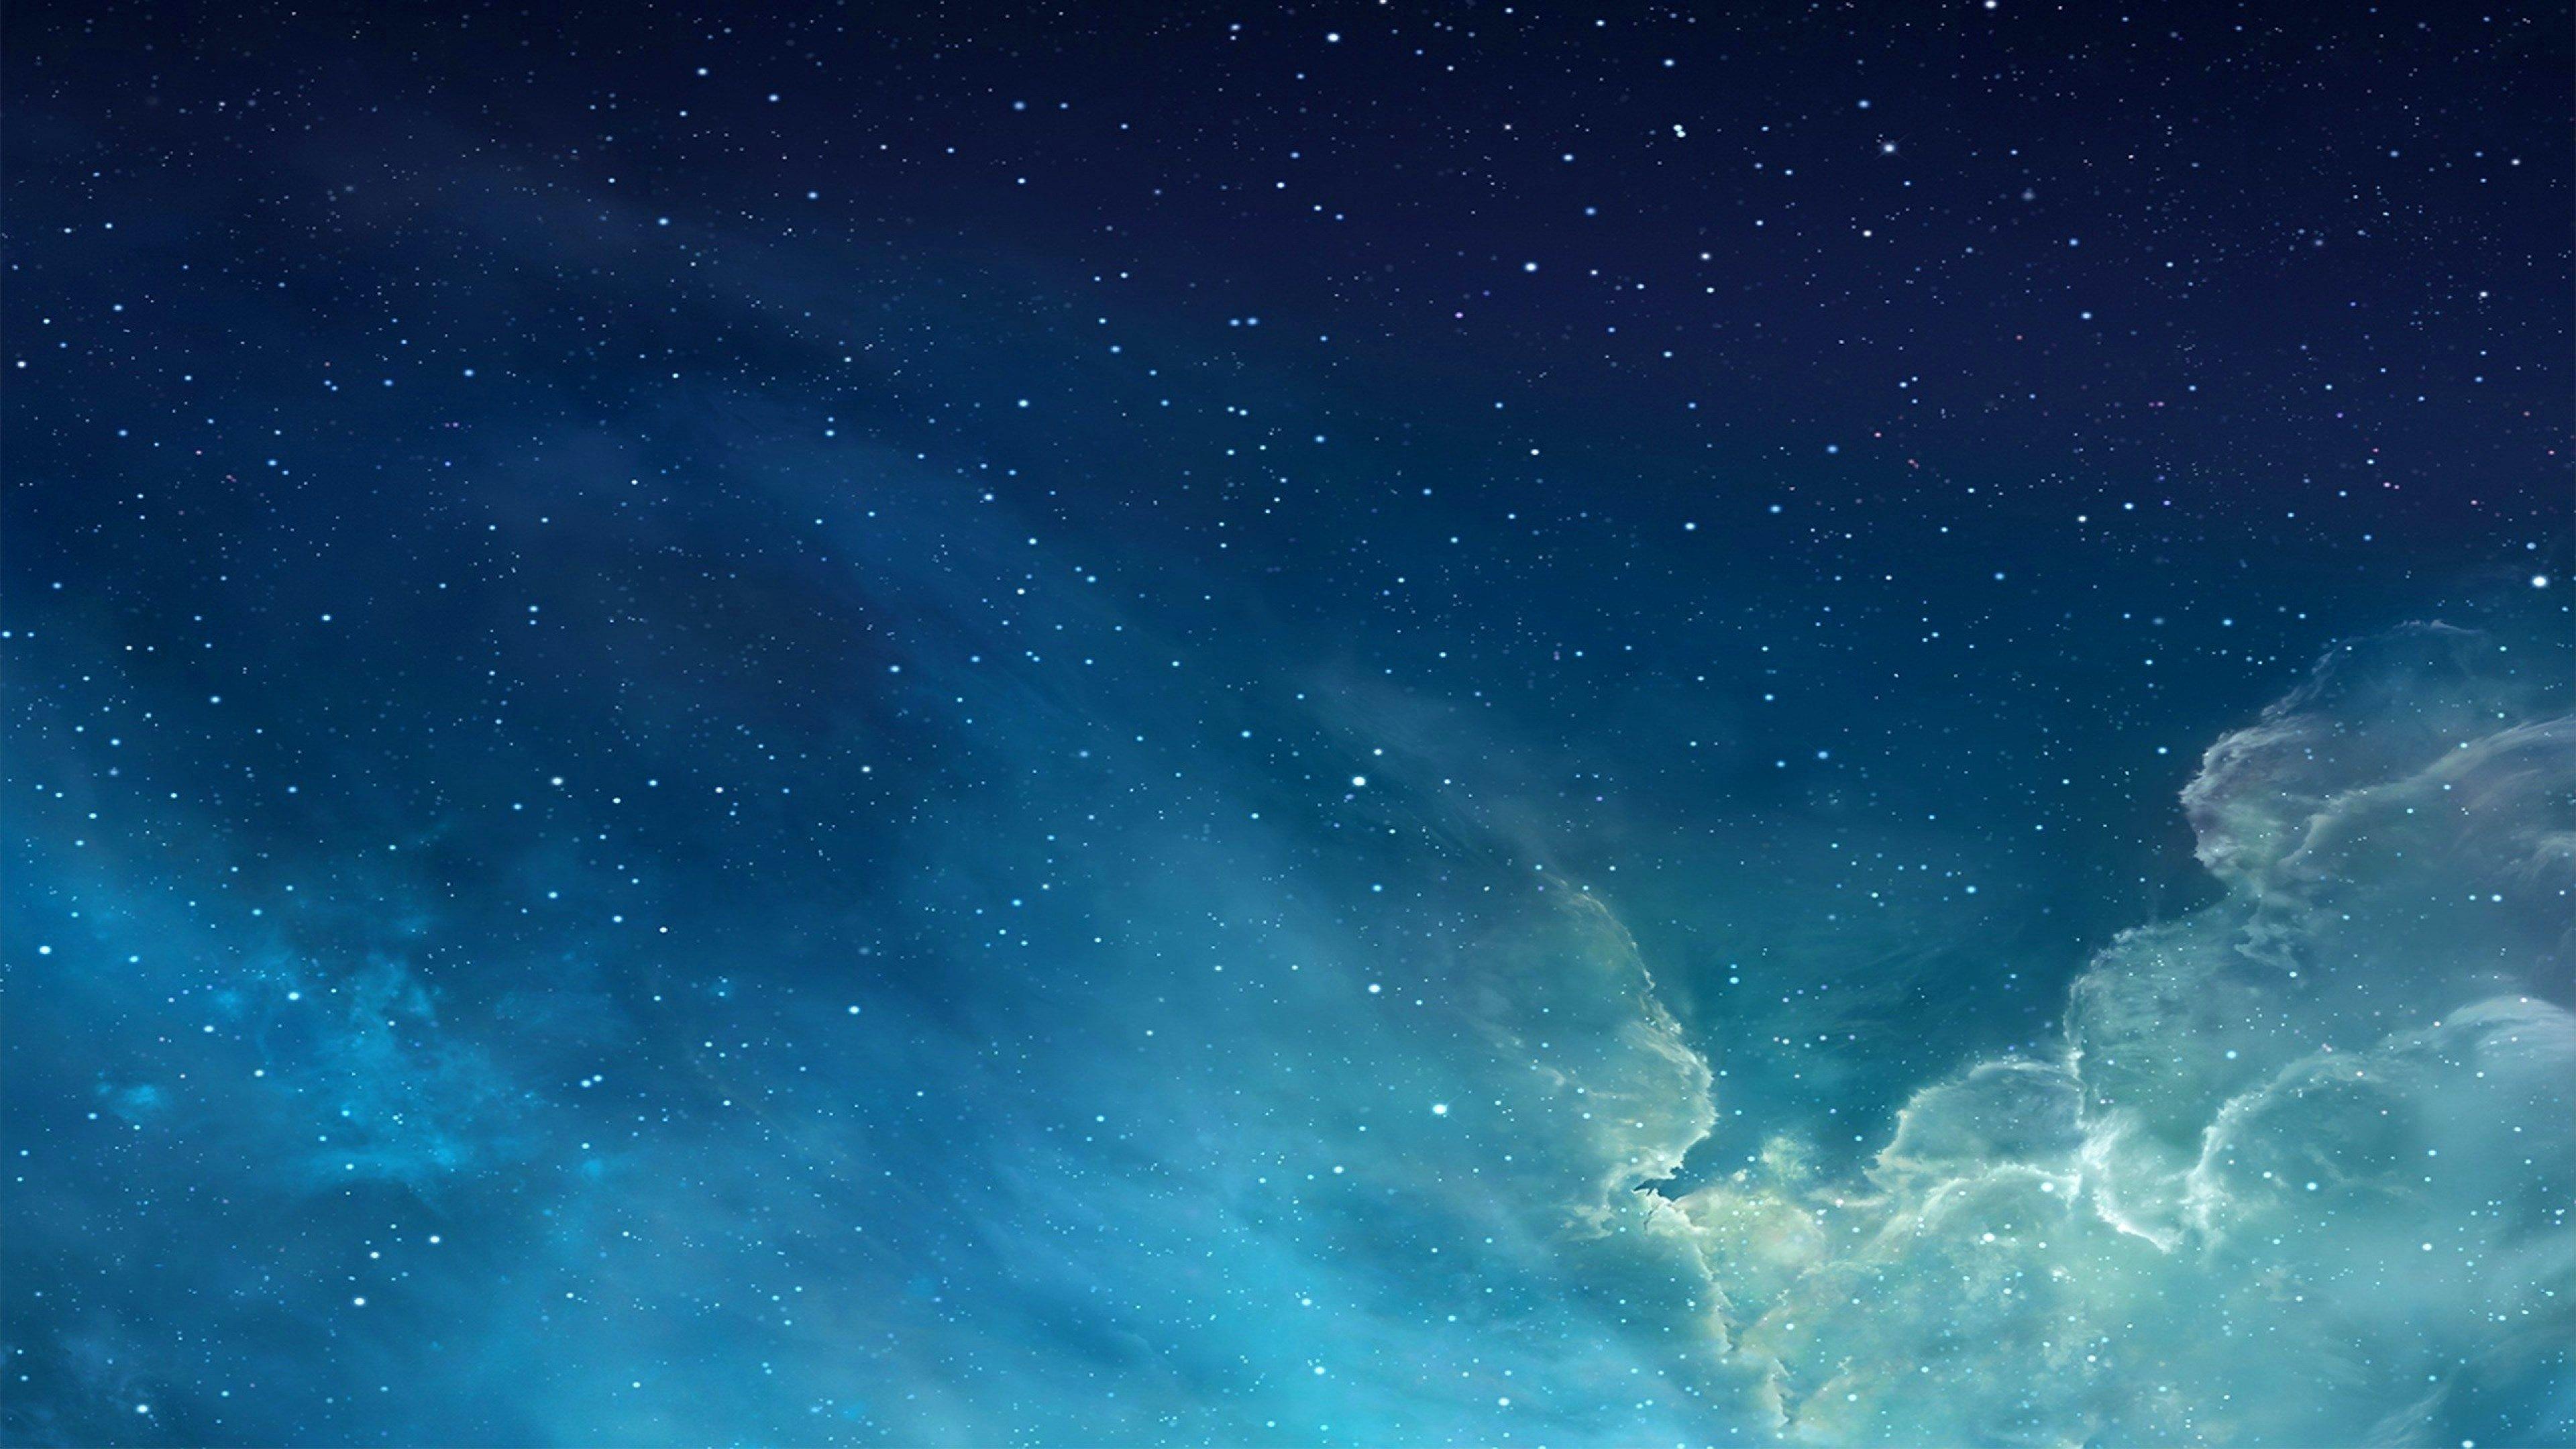 Macbook Pro Wallpaper 4k Space Trick Nebula Clip Art Art